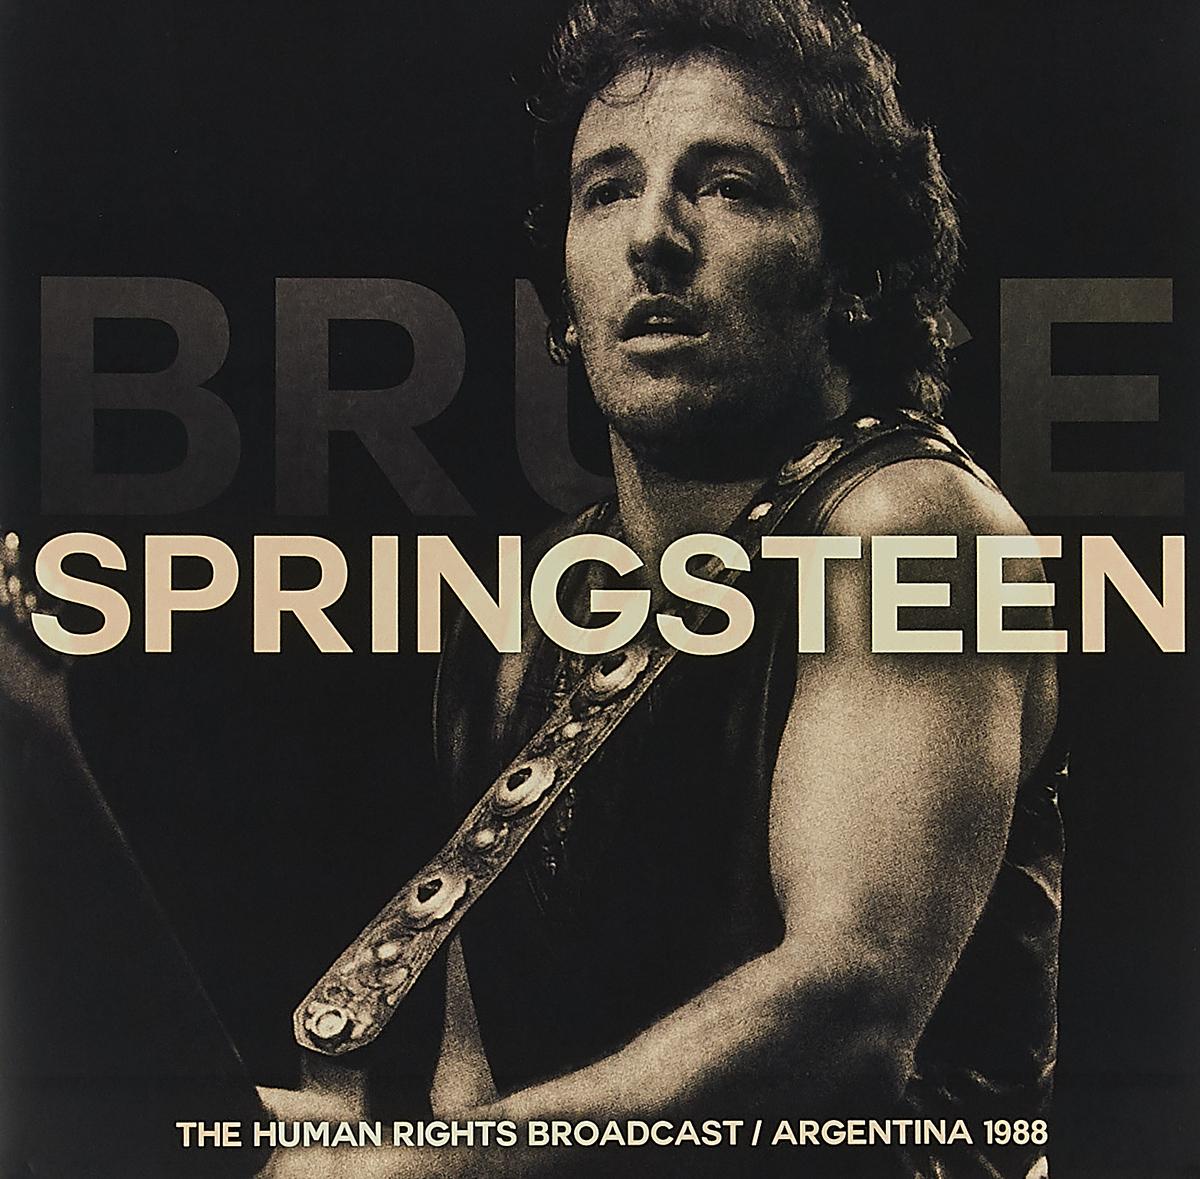 Брюс Спрингстин Bruce Springsteen. The Human Rights Broadcast / Argentina 1988 (2 LP) bruce springsteen bruce springsteen human touch 2 lp